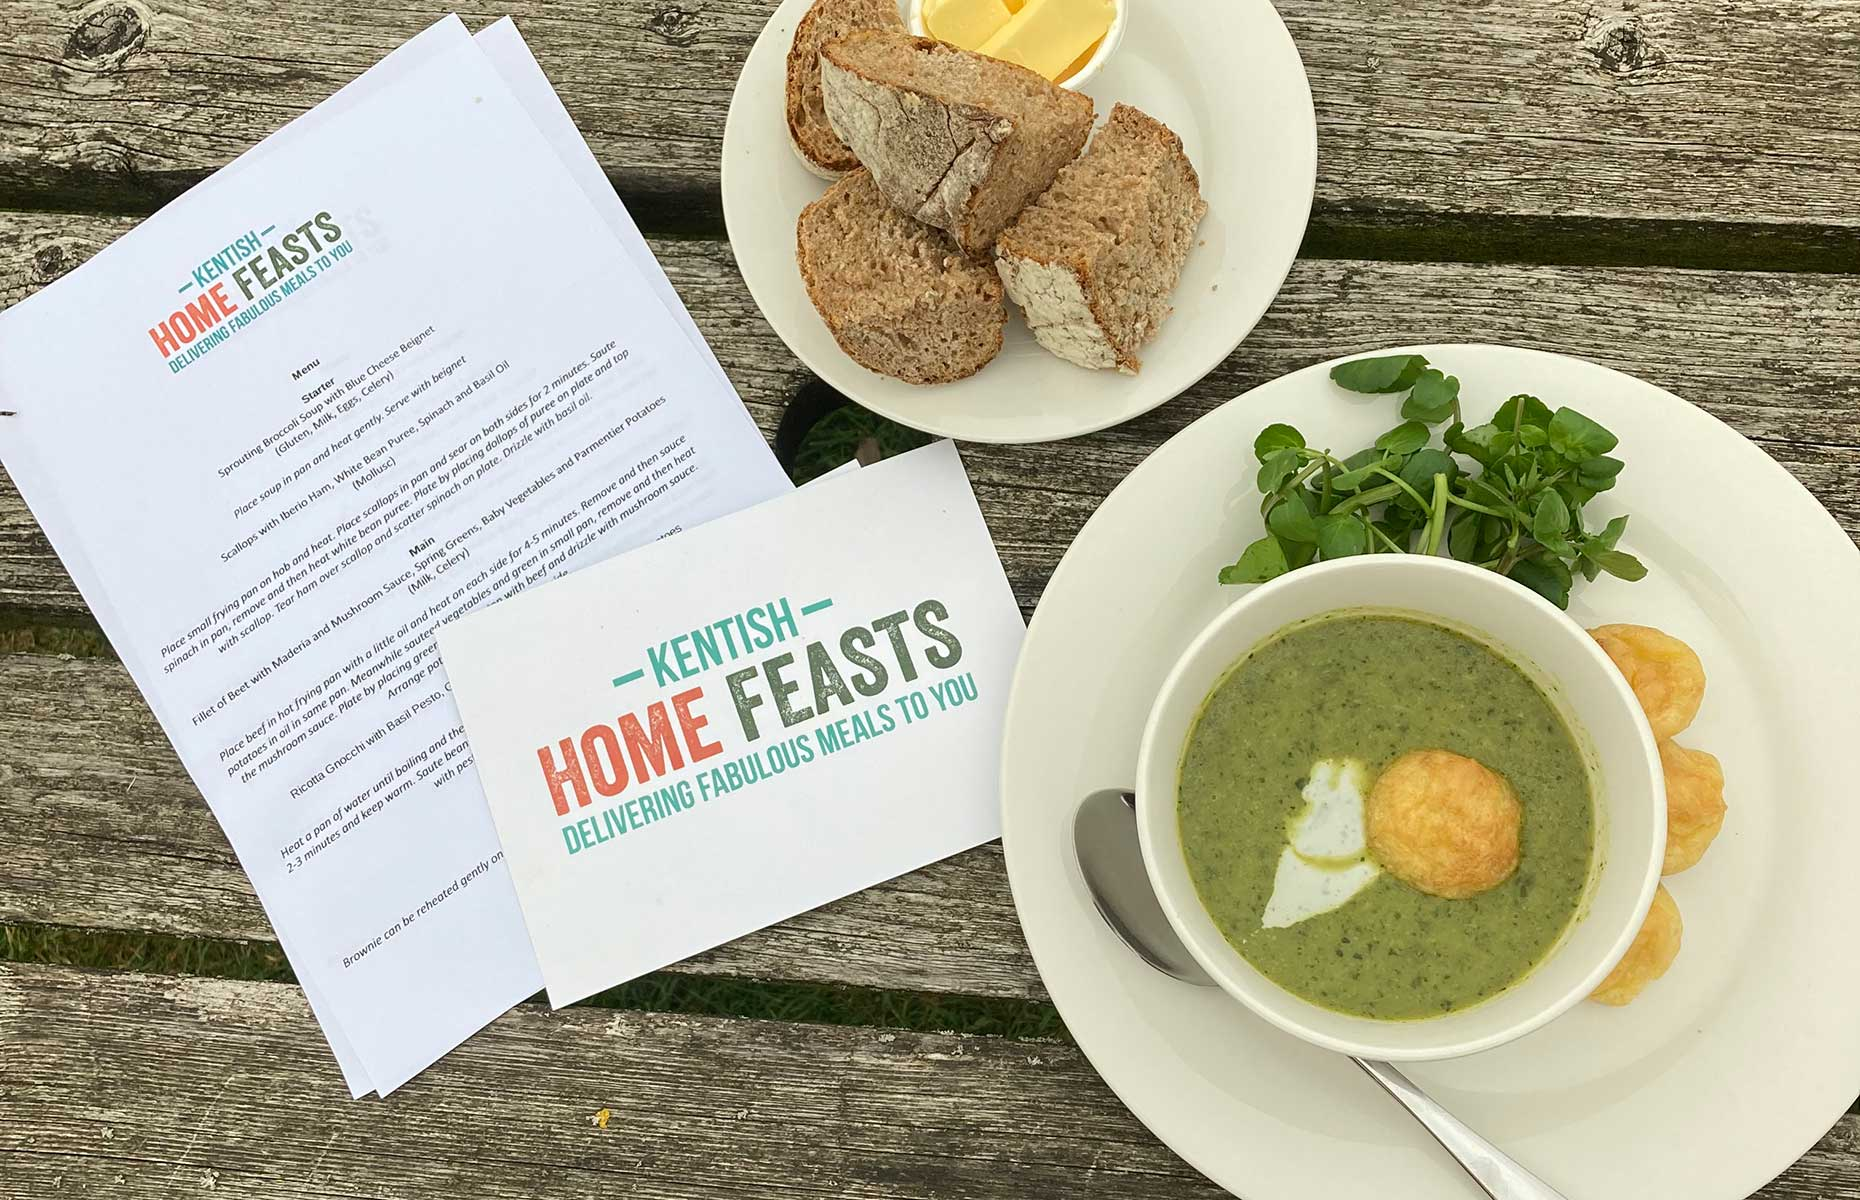 Kentish Home Feasts (Image: Jacqui Agate)